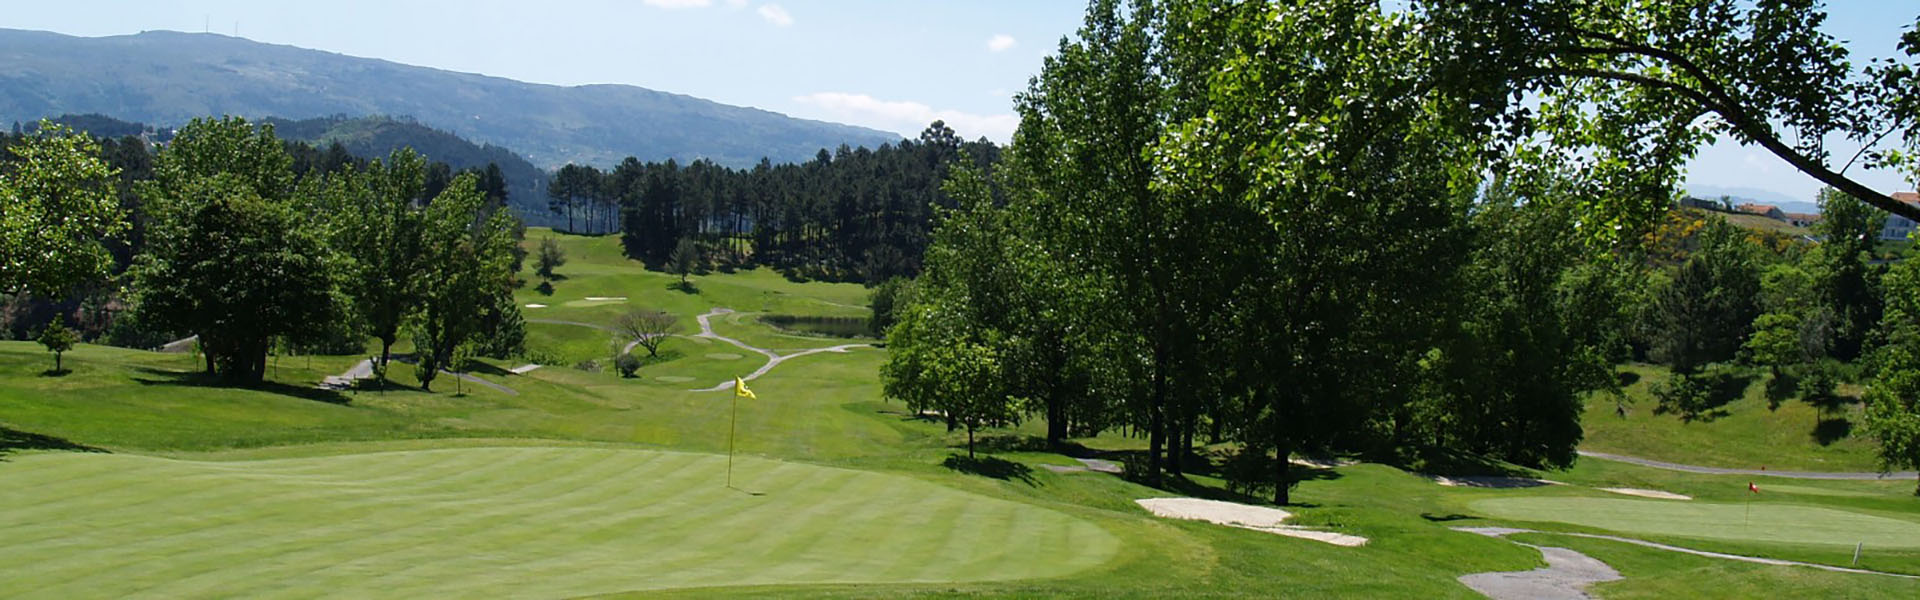 amarante-golf